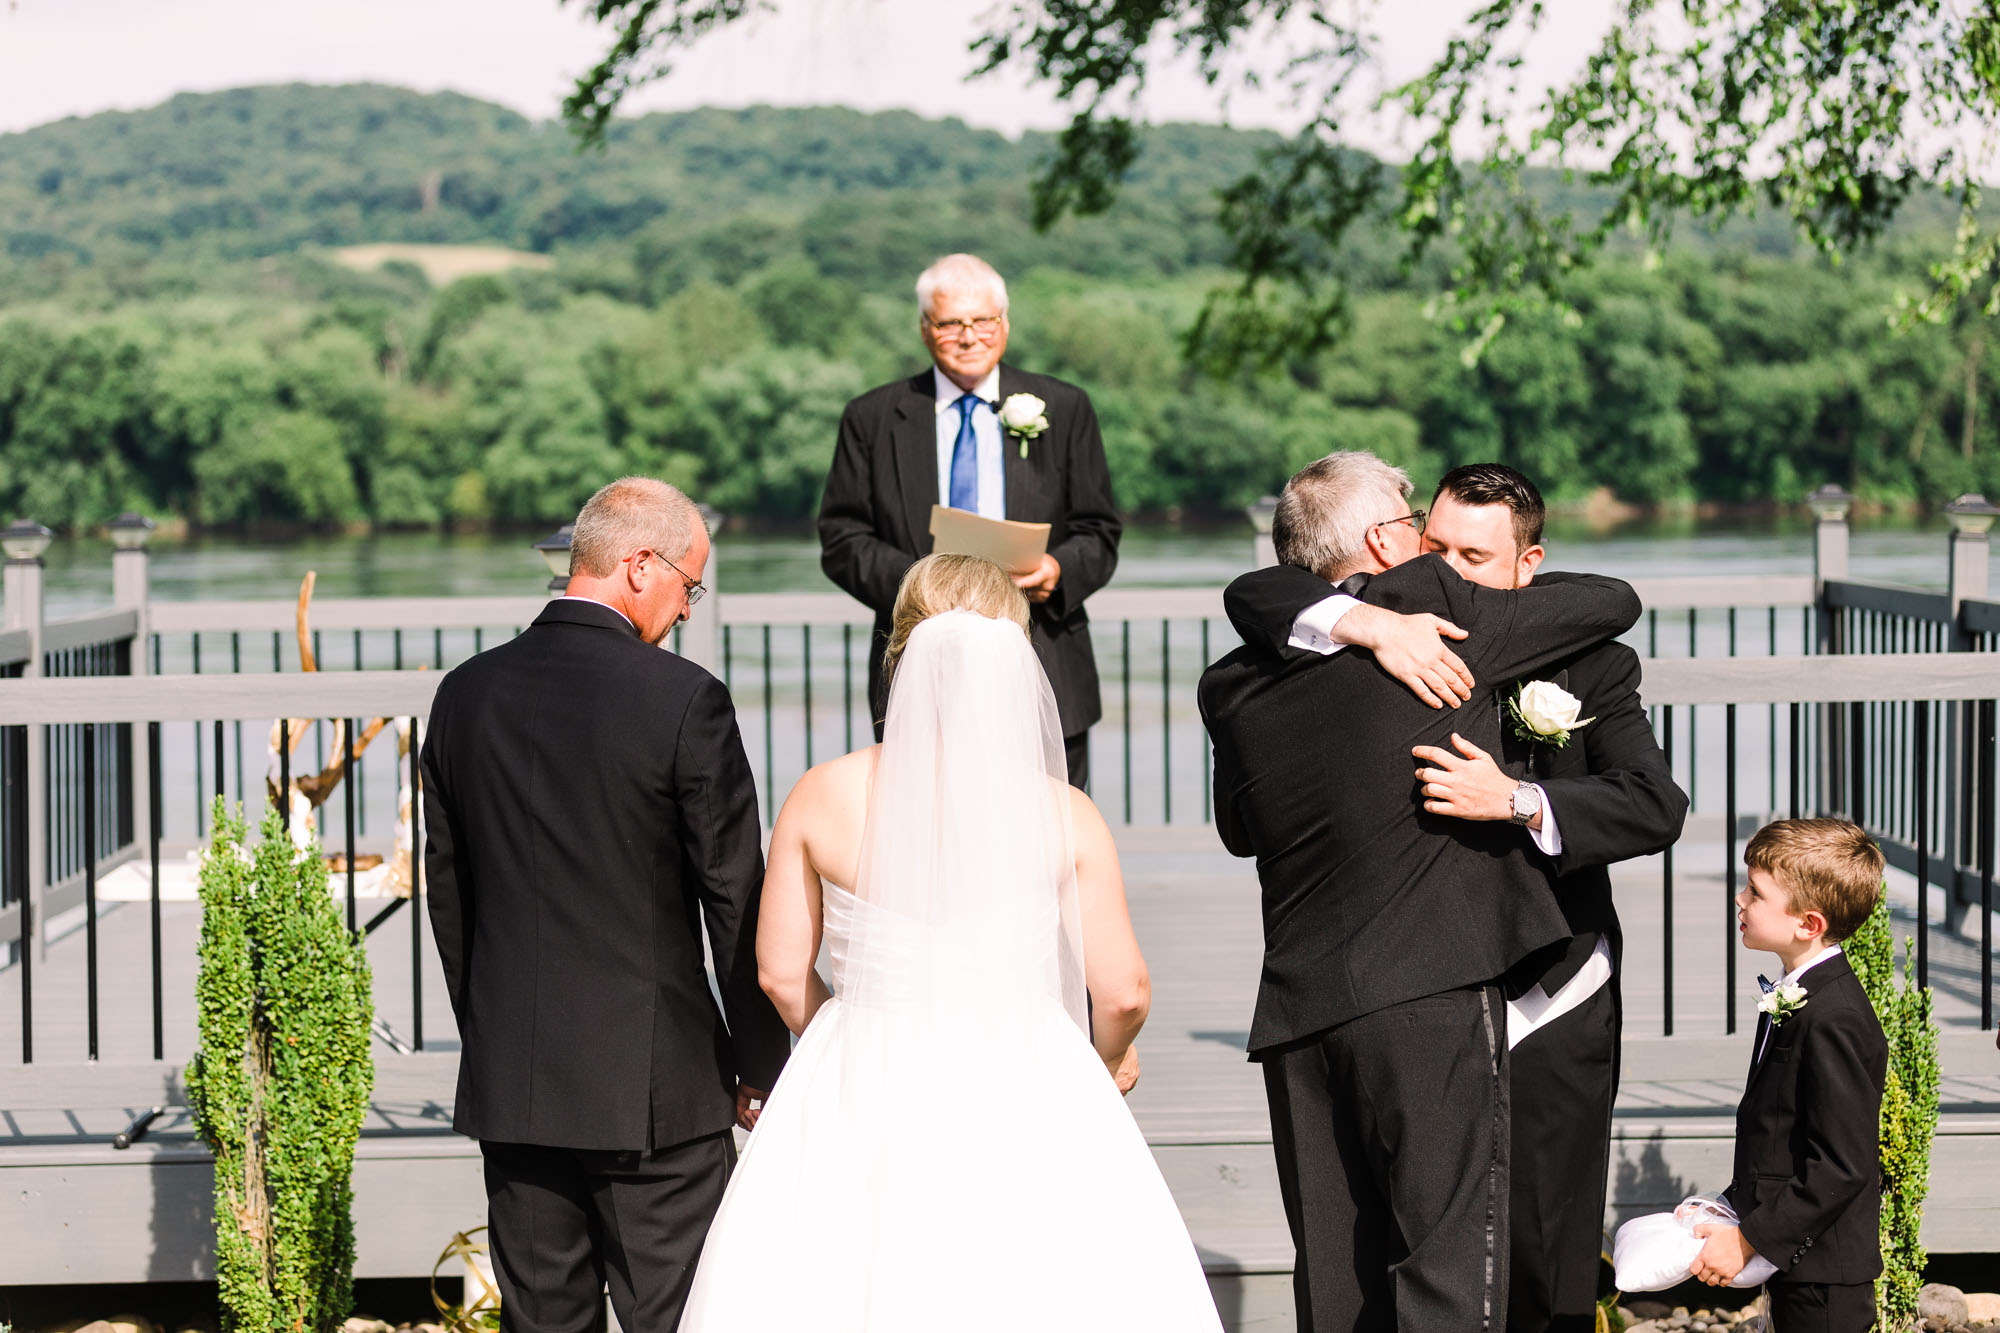 isle-of-que-wedding-3819.jpg